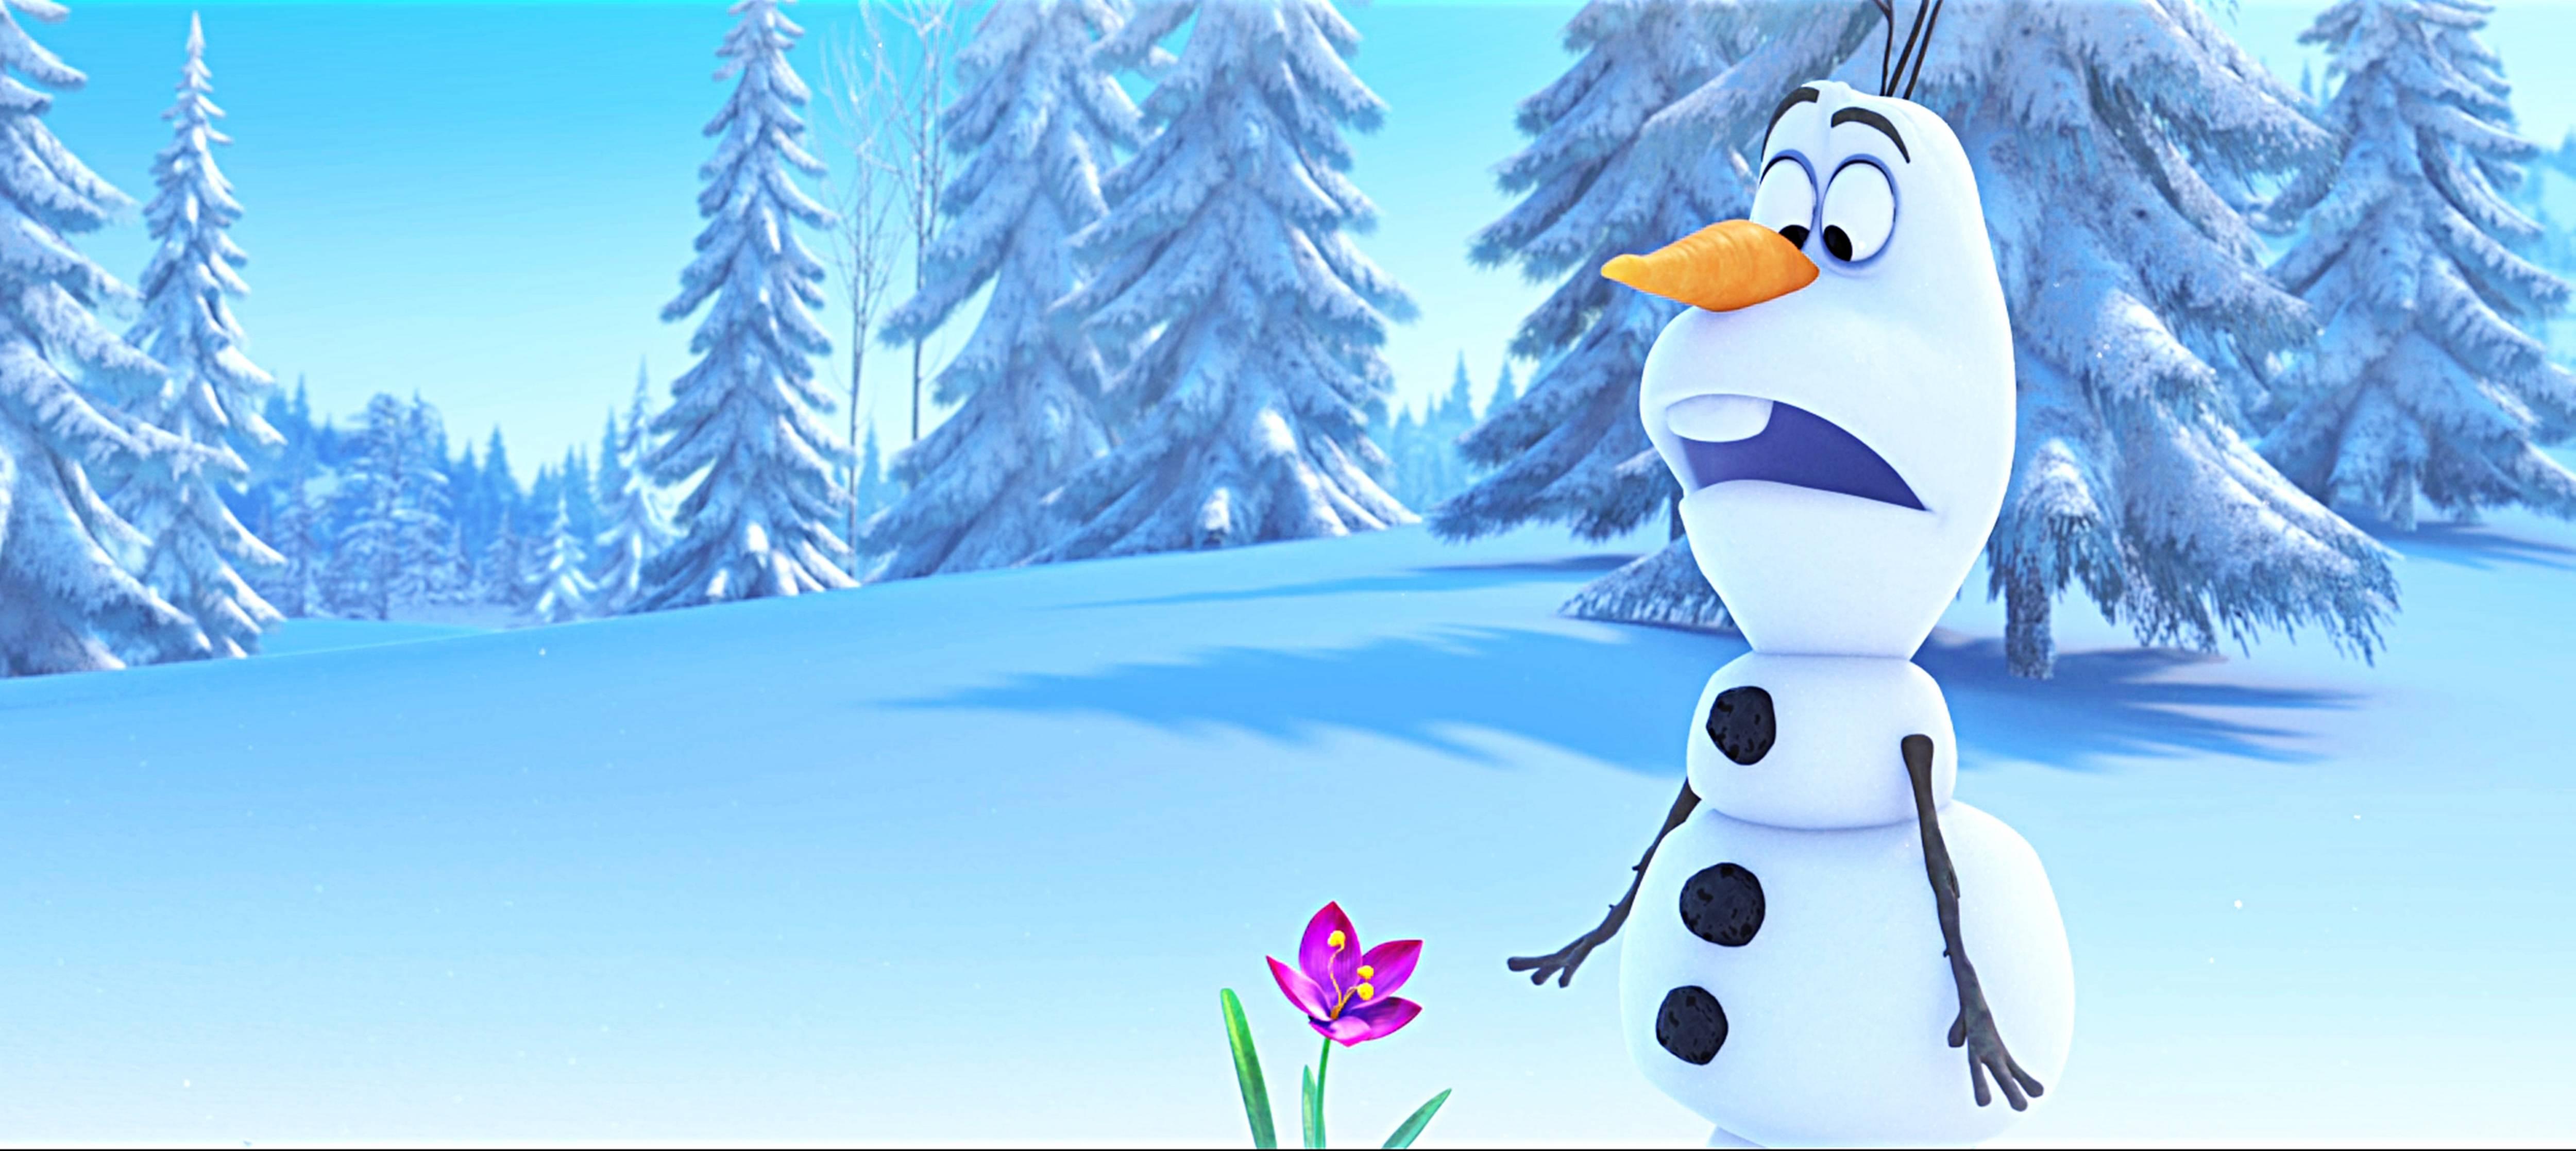 Frozen Olaf Baby Unicorn   Download Wallpaper Desktop 5000x2234